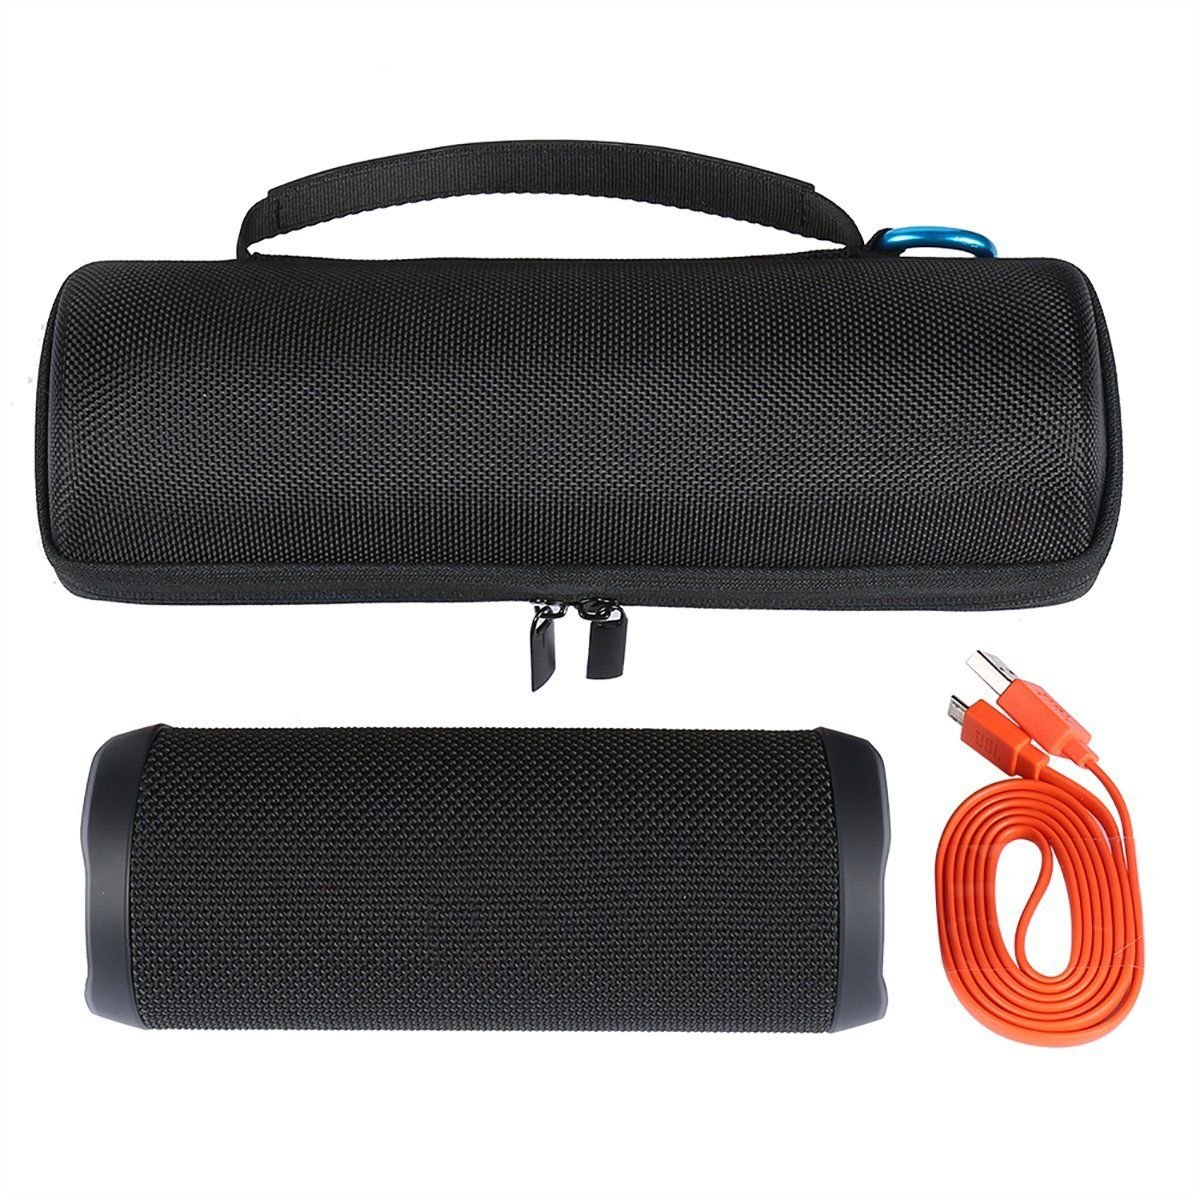 FidgetFidget Travel Zipper Case Cover Protective Bag for JBL Flip4 Wireless Bluetooth Speaker